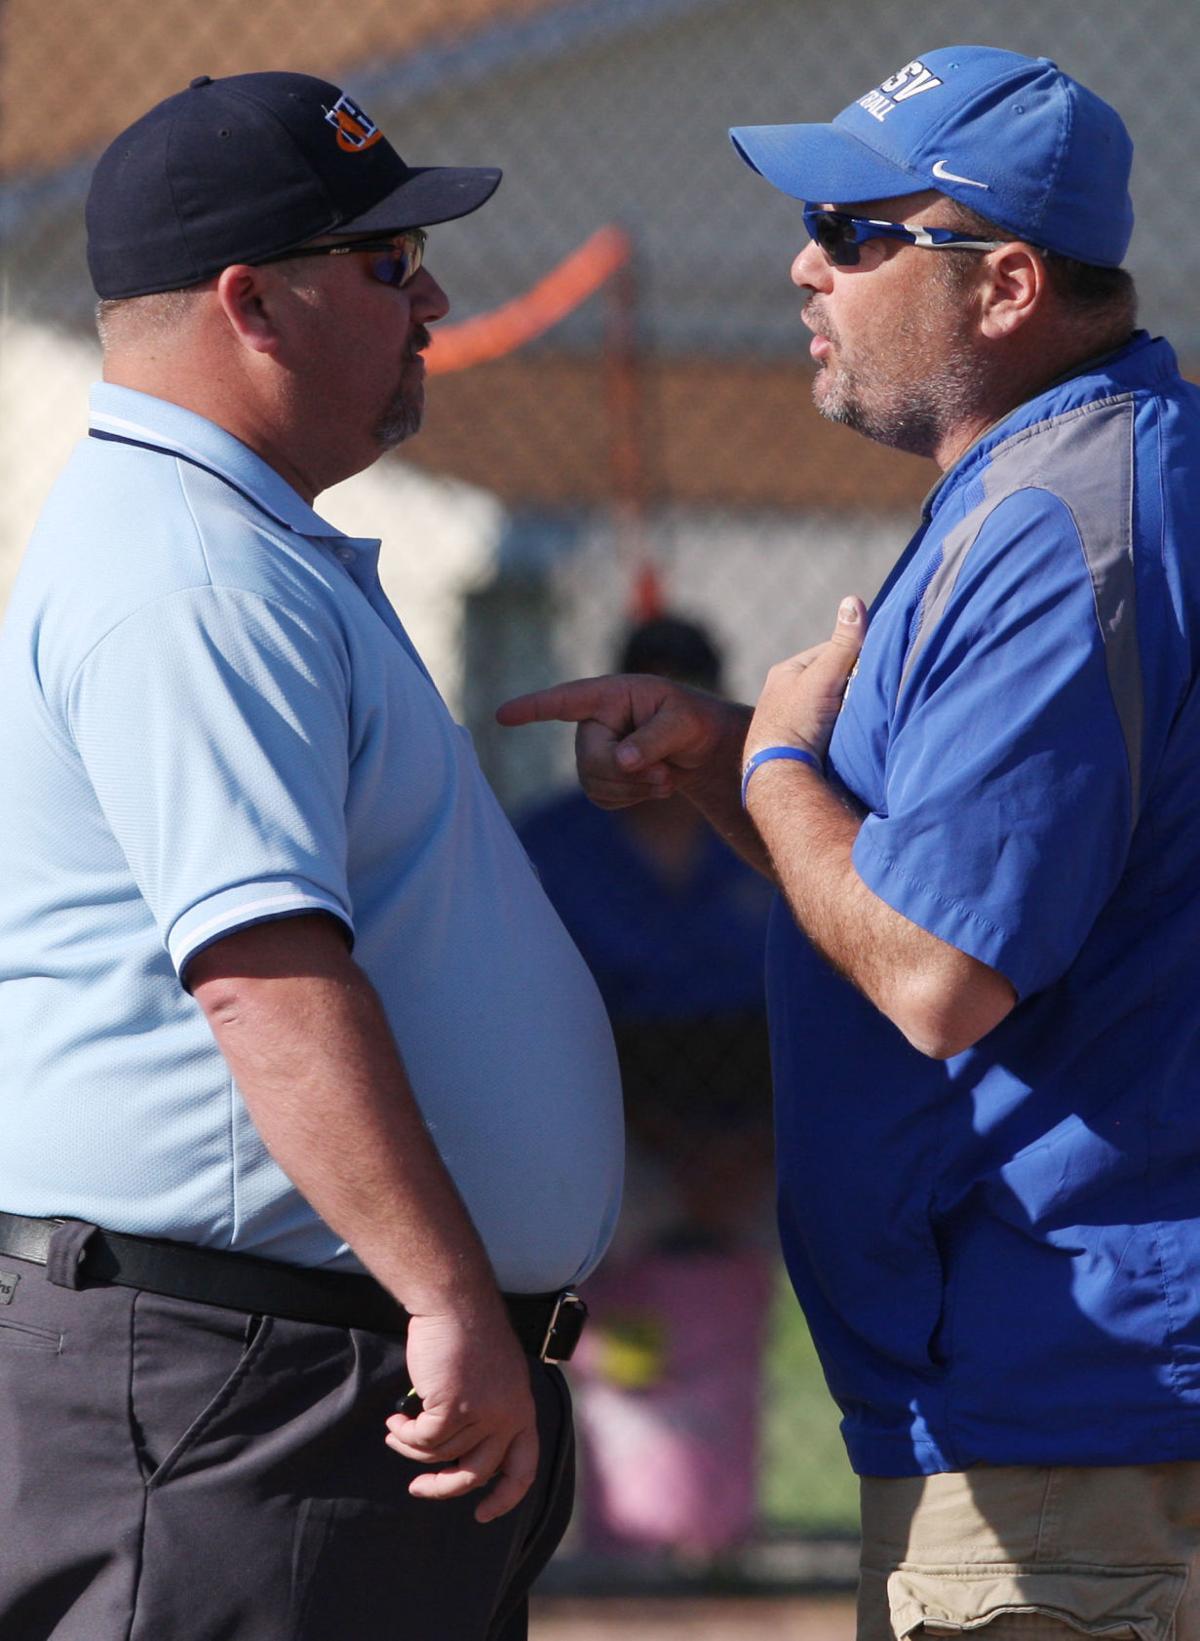 TriCitySangamon Valley vs Argenta Oreana softball 15 5.7.18.jpg